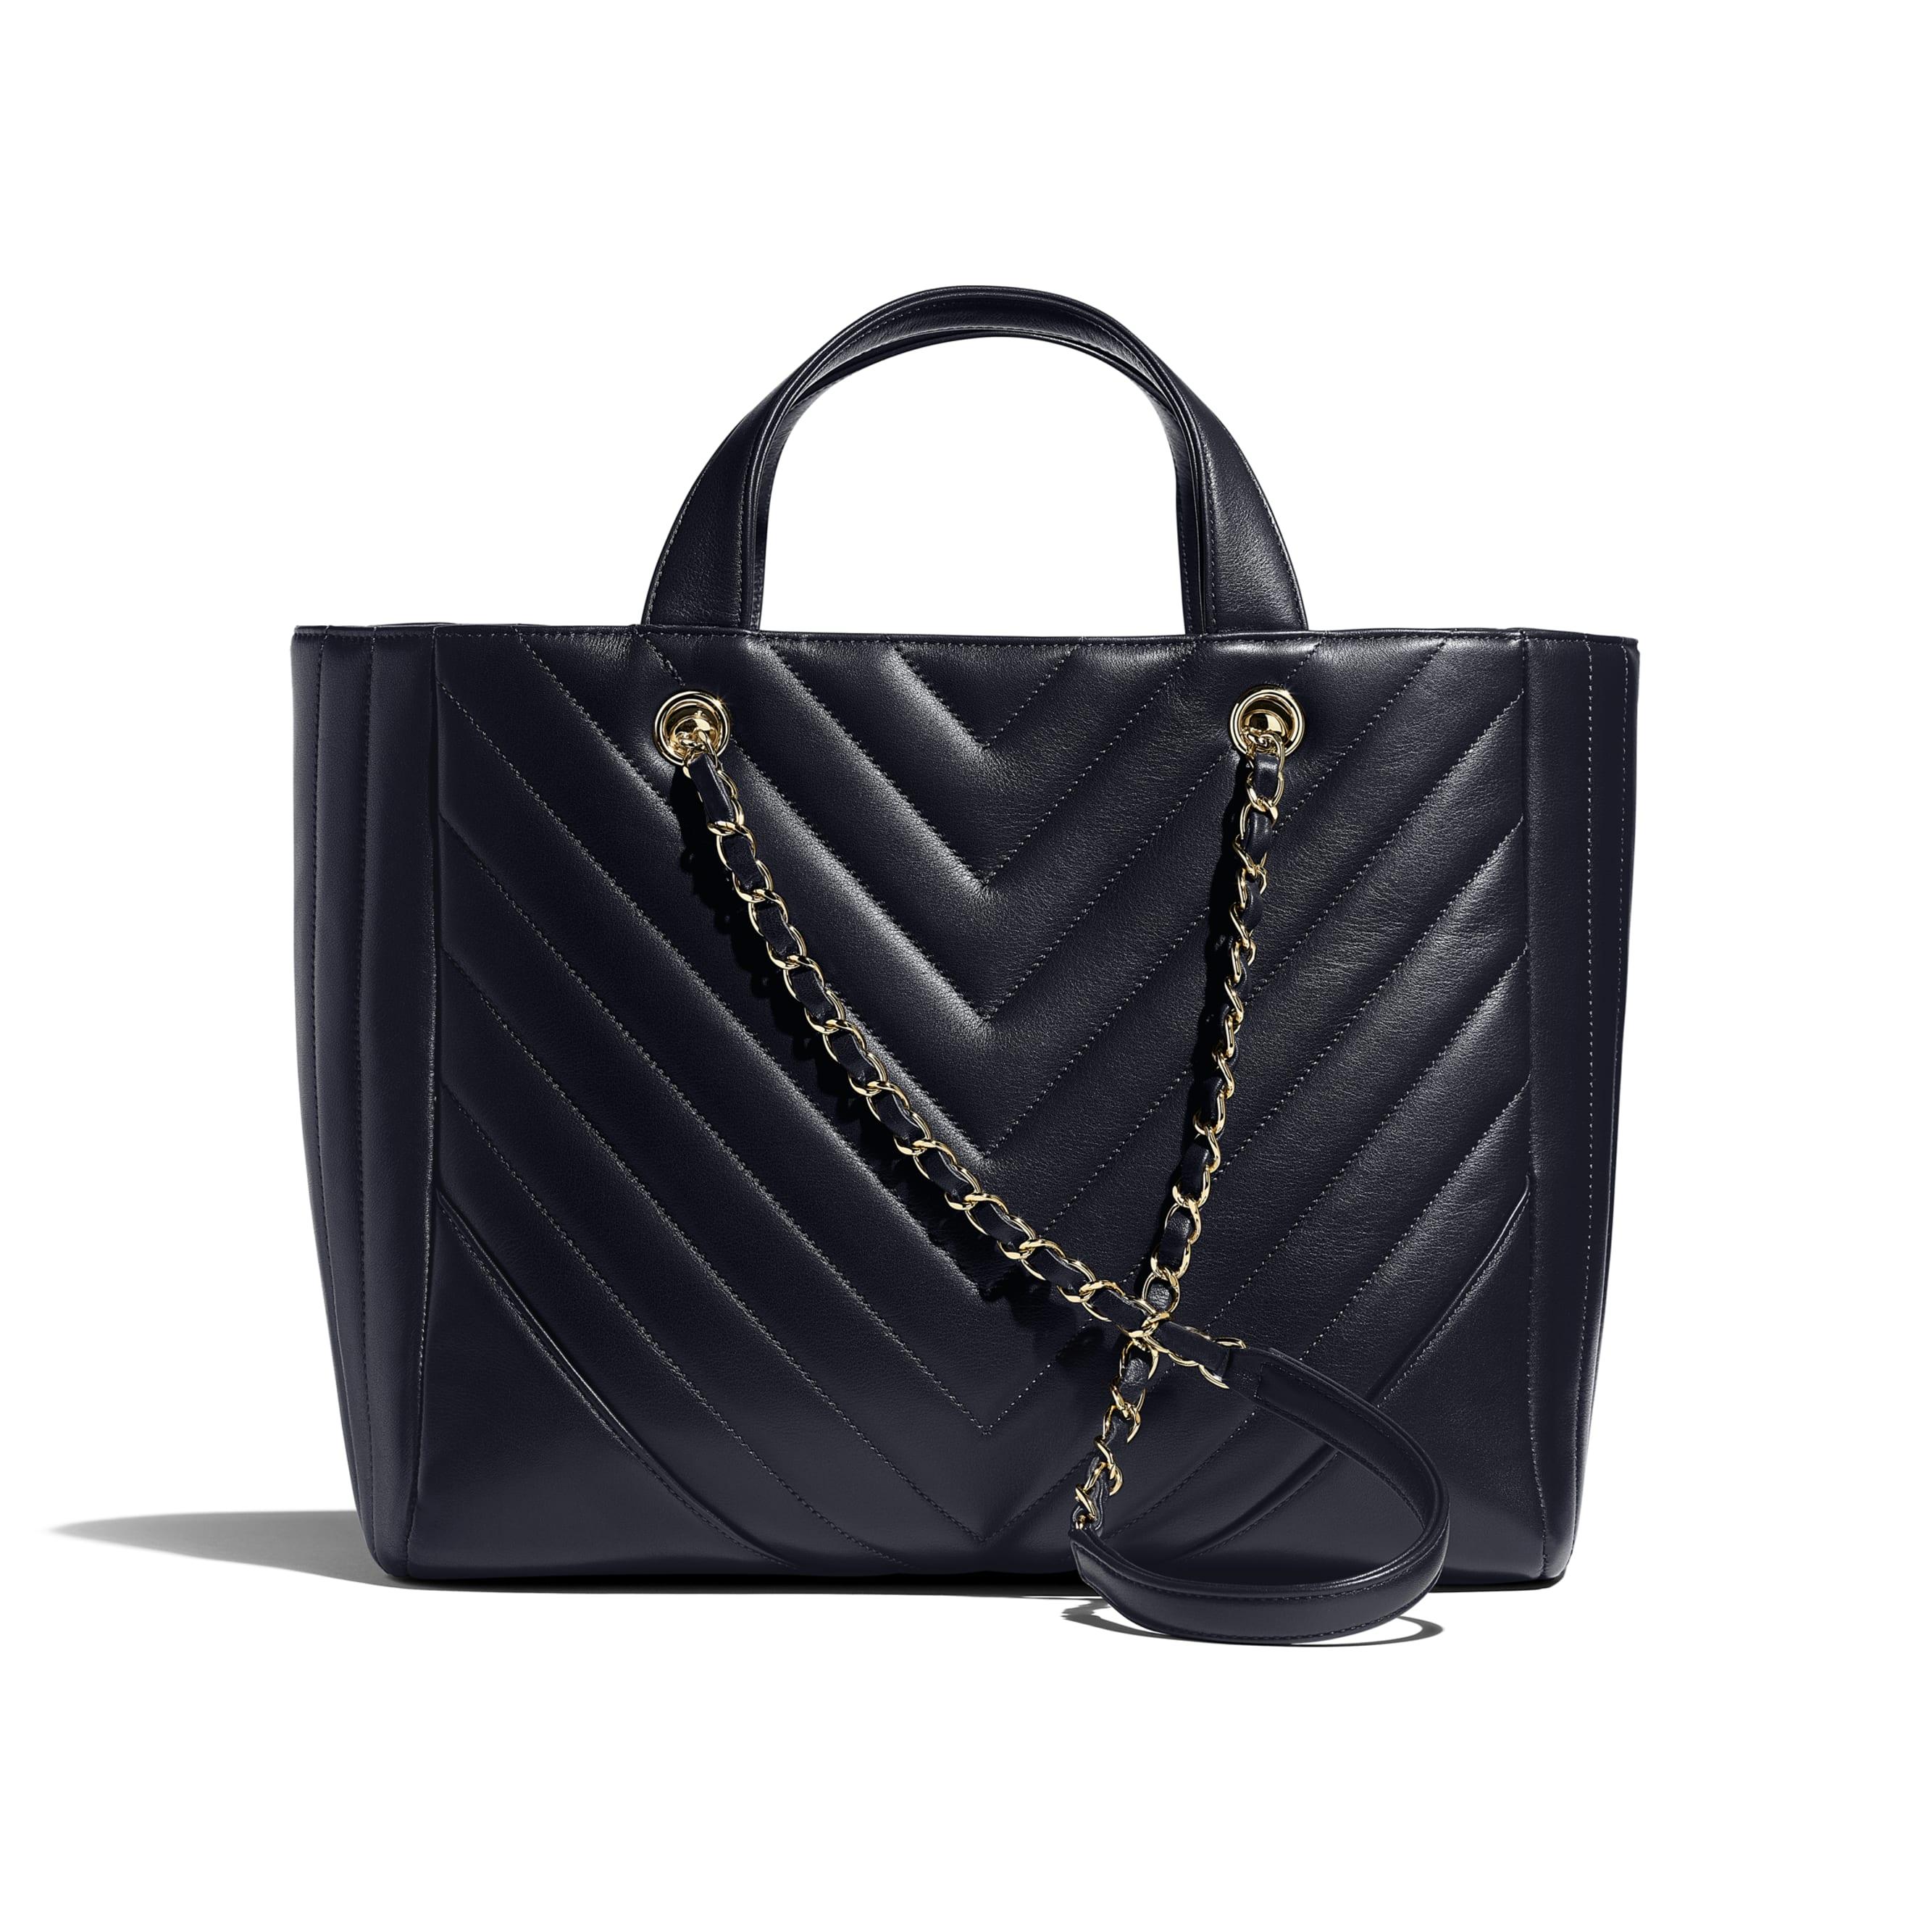 Large Shopping Bag - Navy Blue - Calfskin & Gold-Tone Metal - Alternative view - see standard sized version